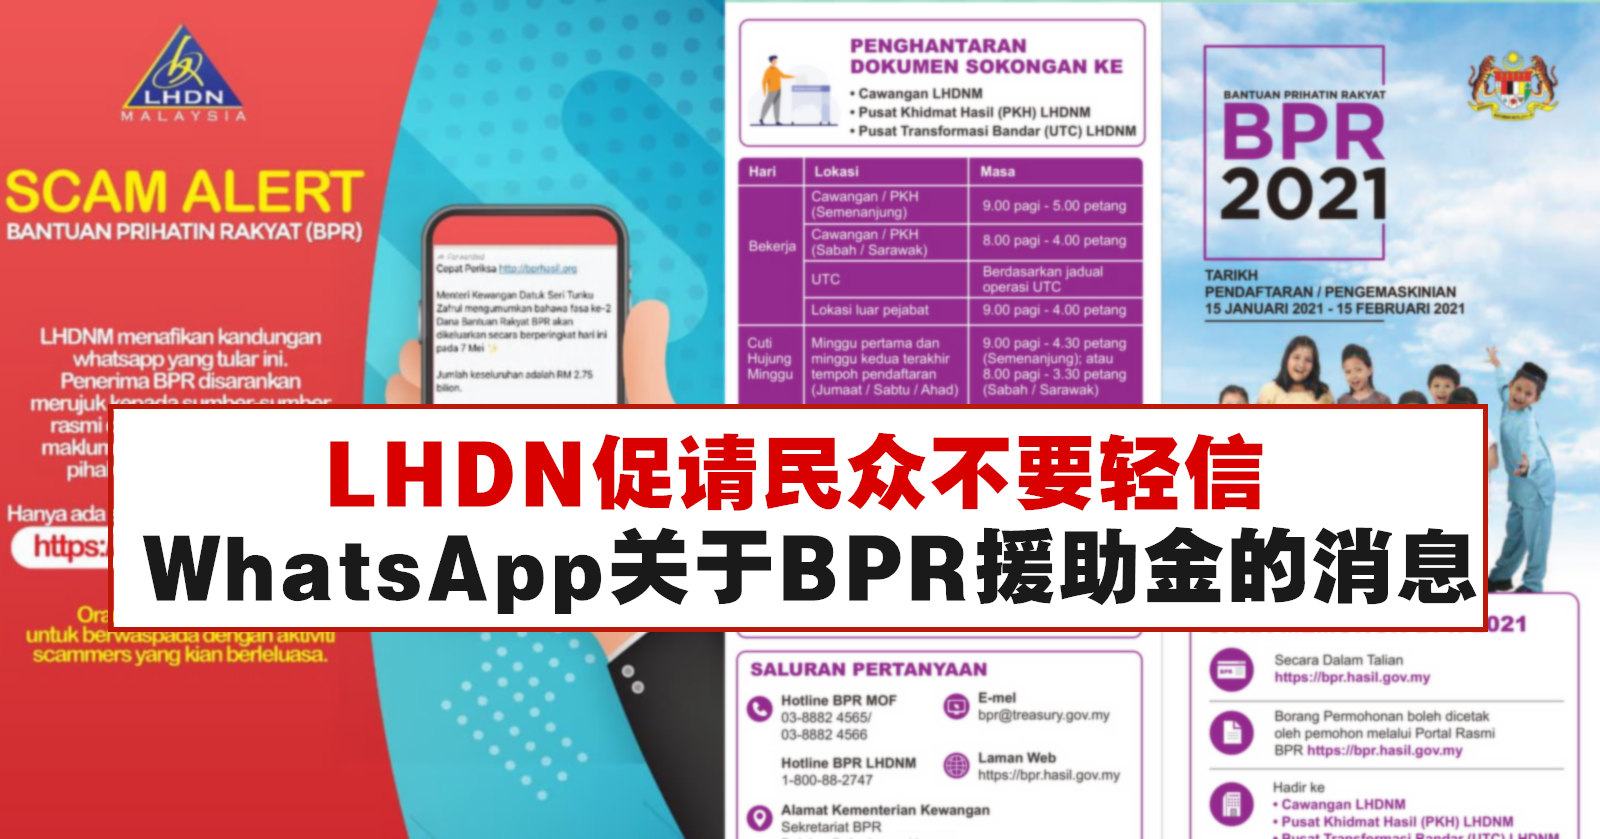 LHDN促请民众不要轻信WhatsApp关于BPR援助金的消息